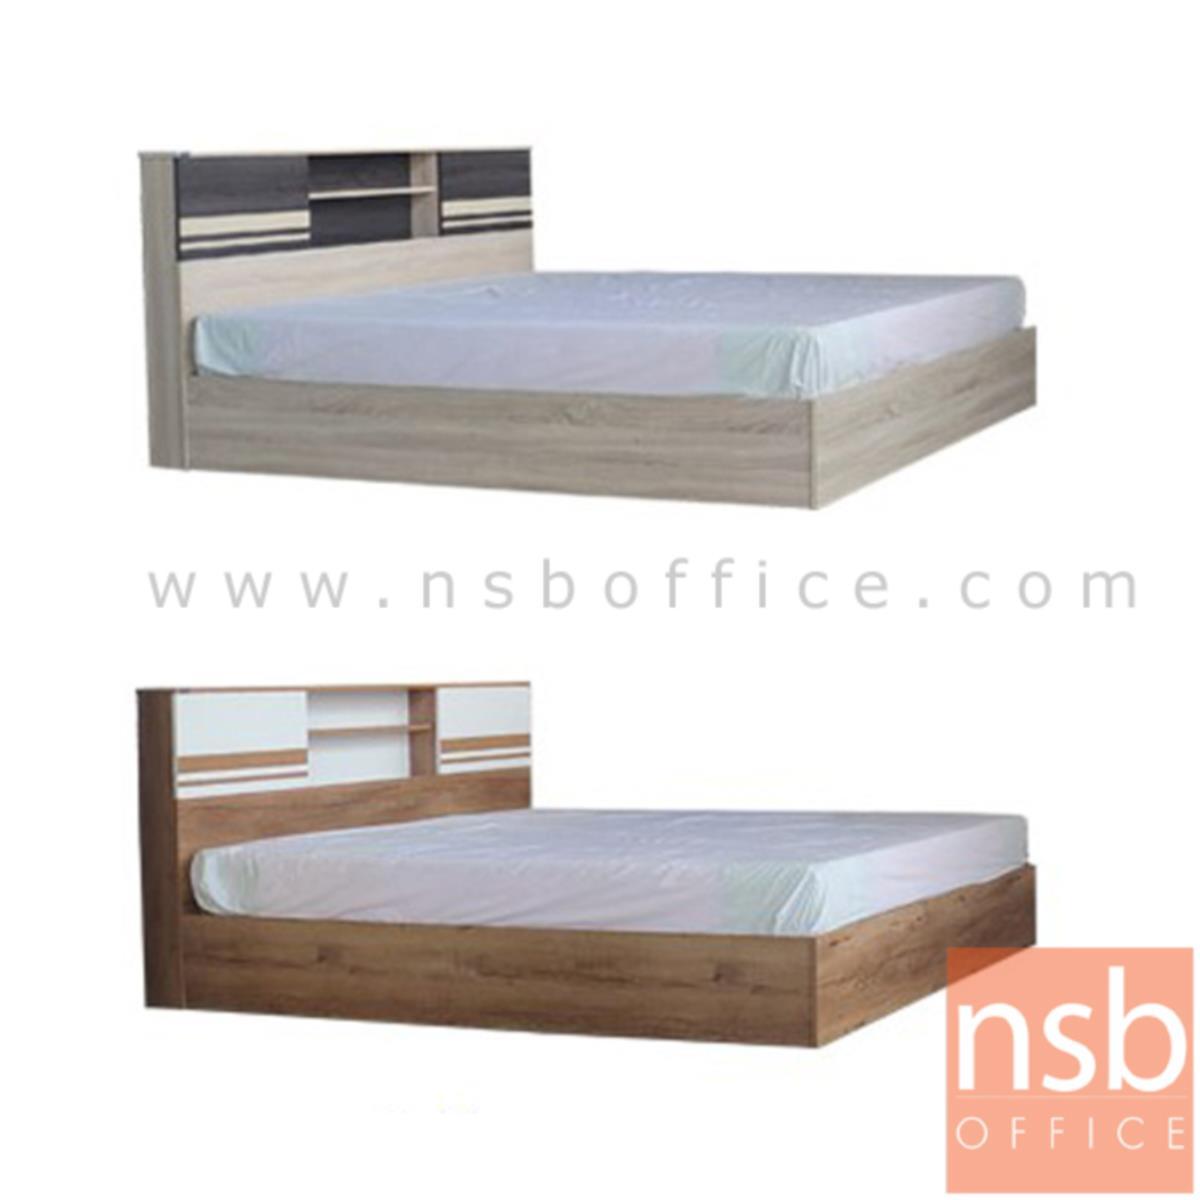 G12A257:เตียงนอนไม้ รุ่น Birdie (เบอร์ดี้) ขนาด 5,6 ฟุต สีสักขาว และสีโซลิค